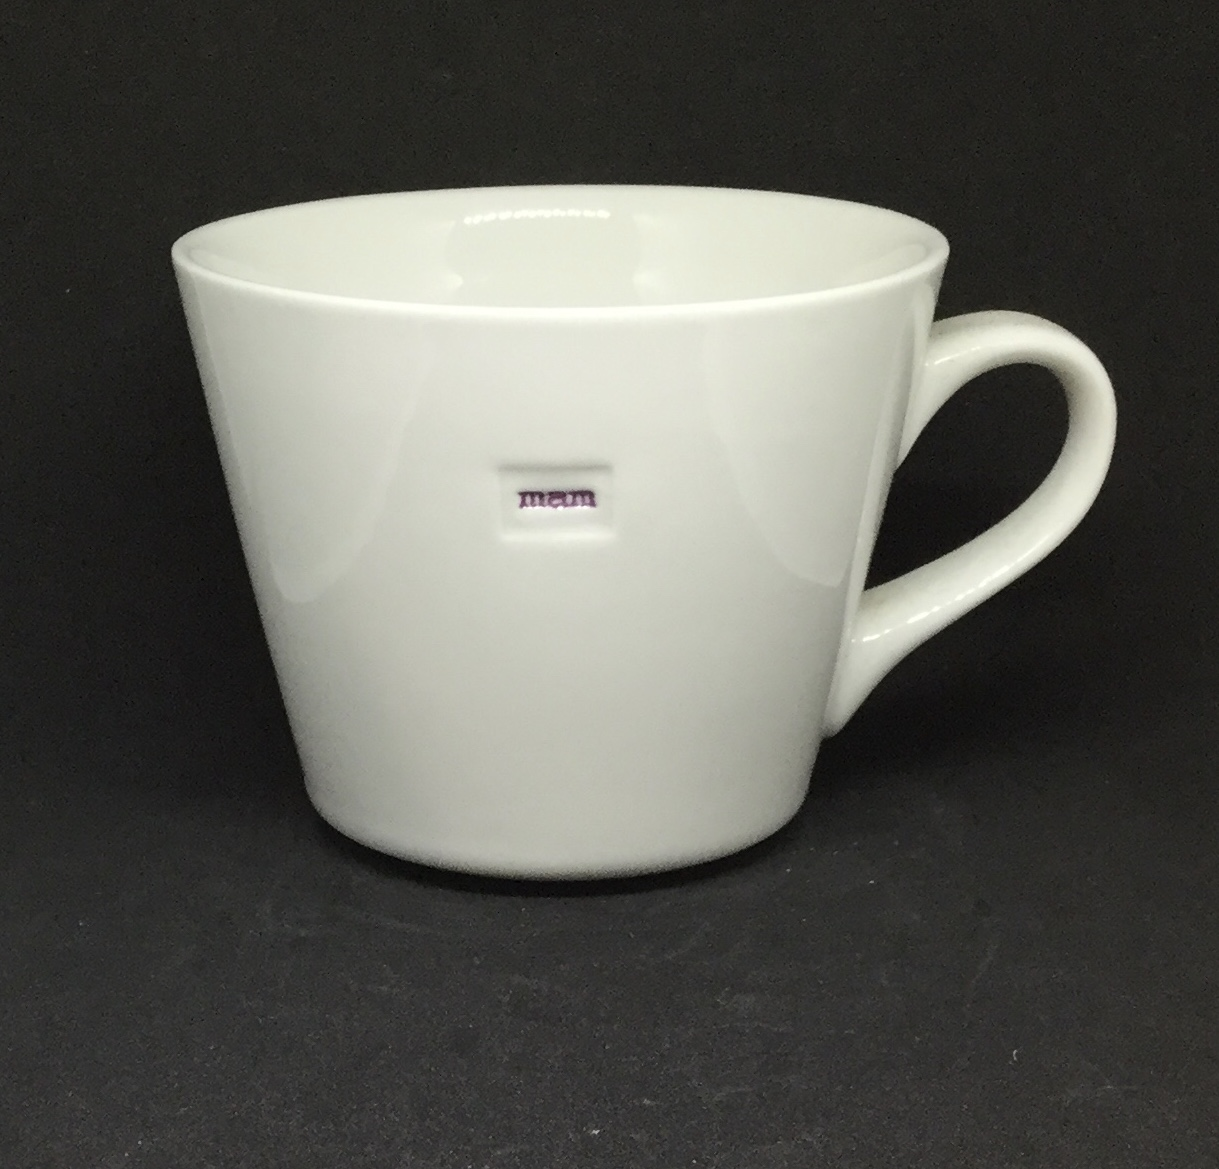 'Mam' fine bone China mug